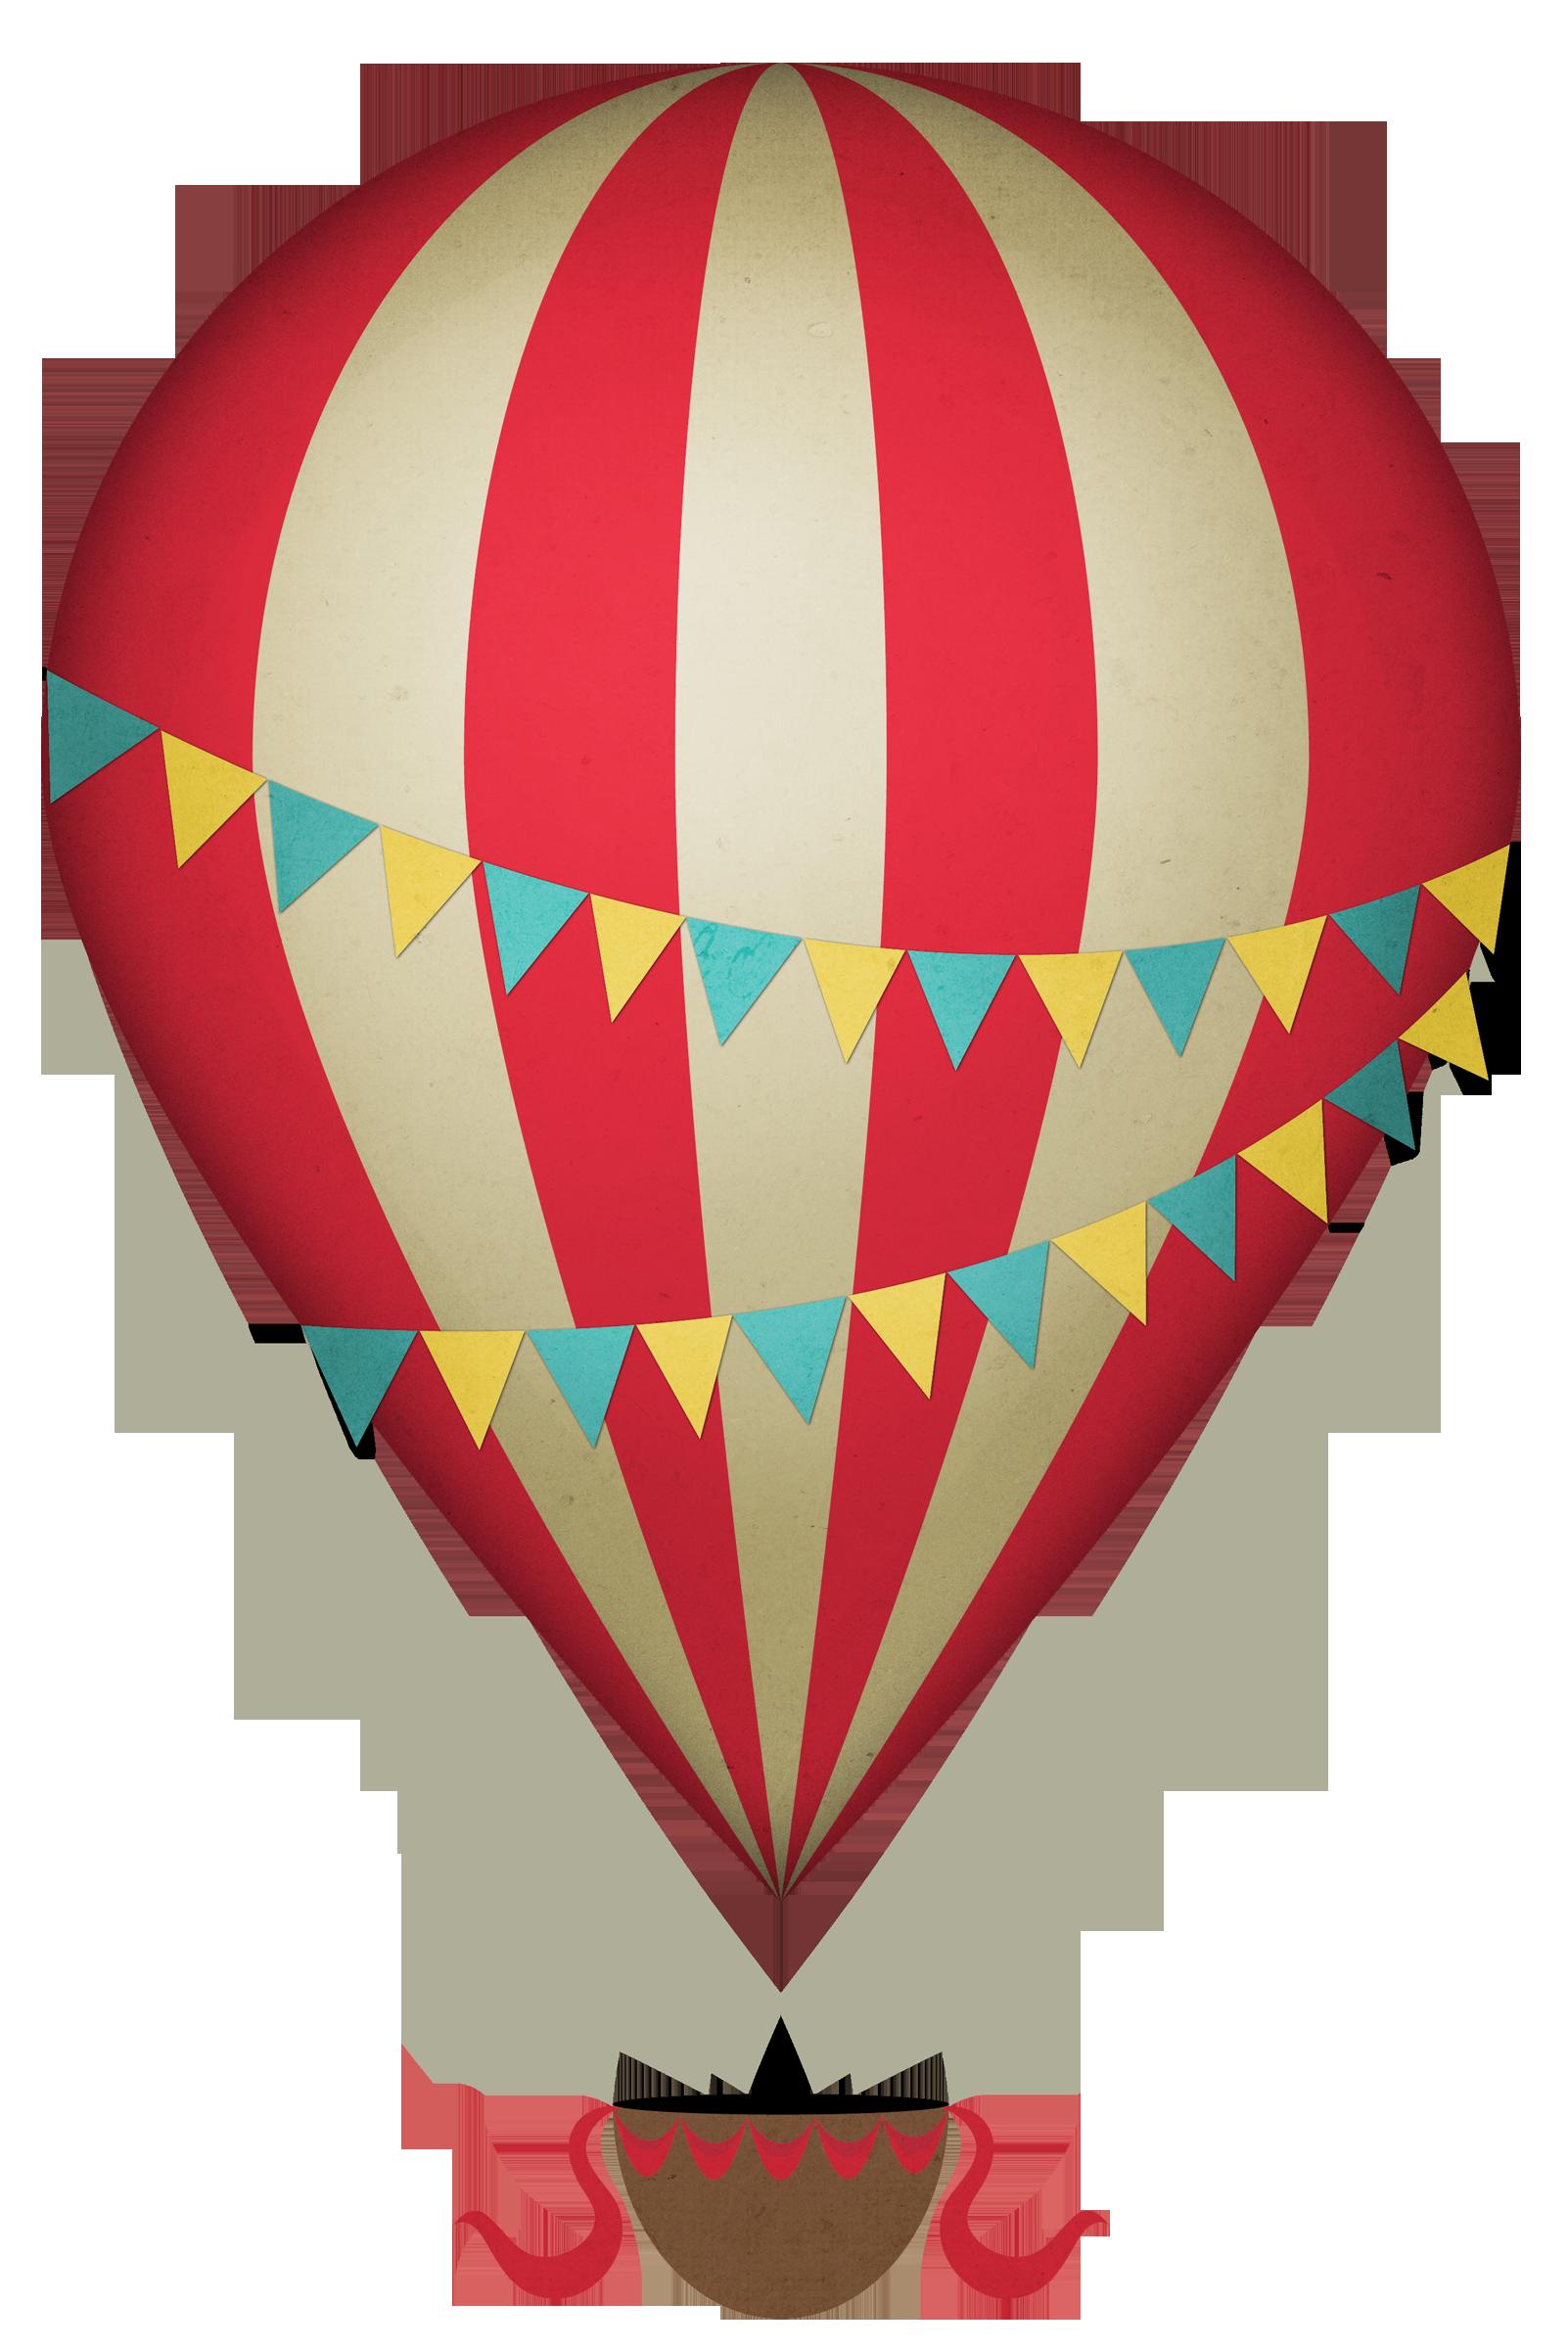 Vintage Hot Air Balloon% In Red Hot Air Balloon Clipart Collection   Clipartfox